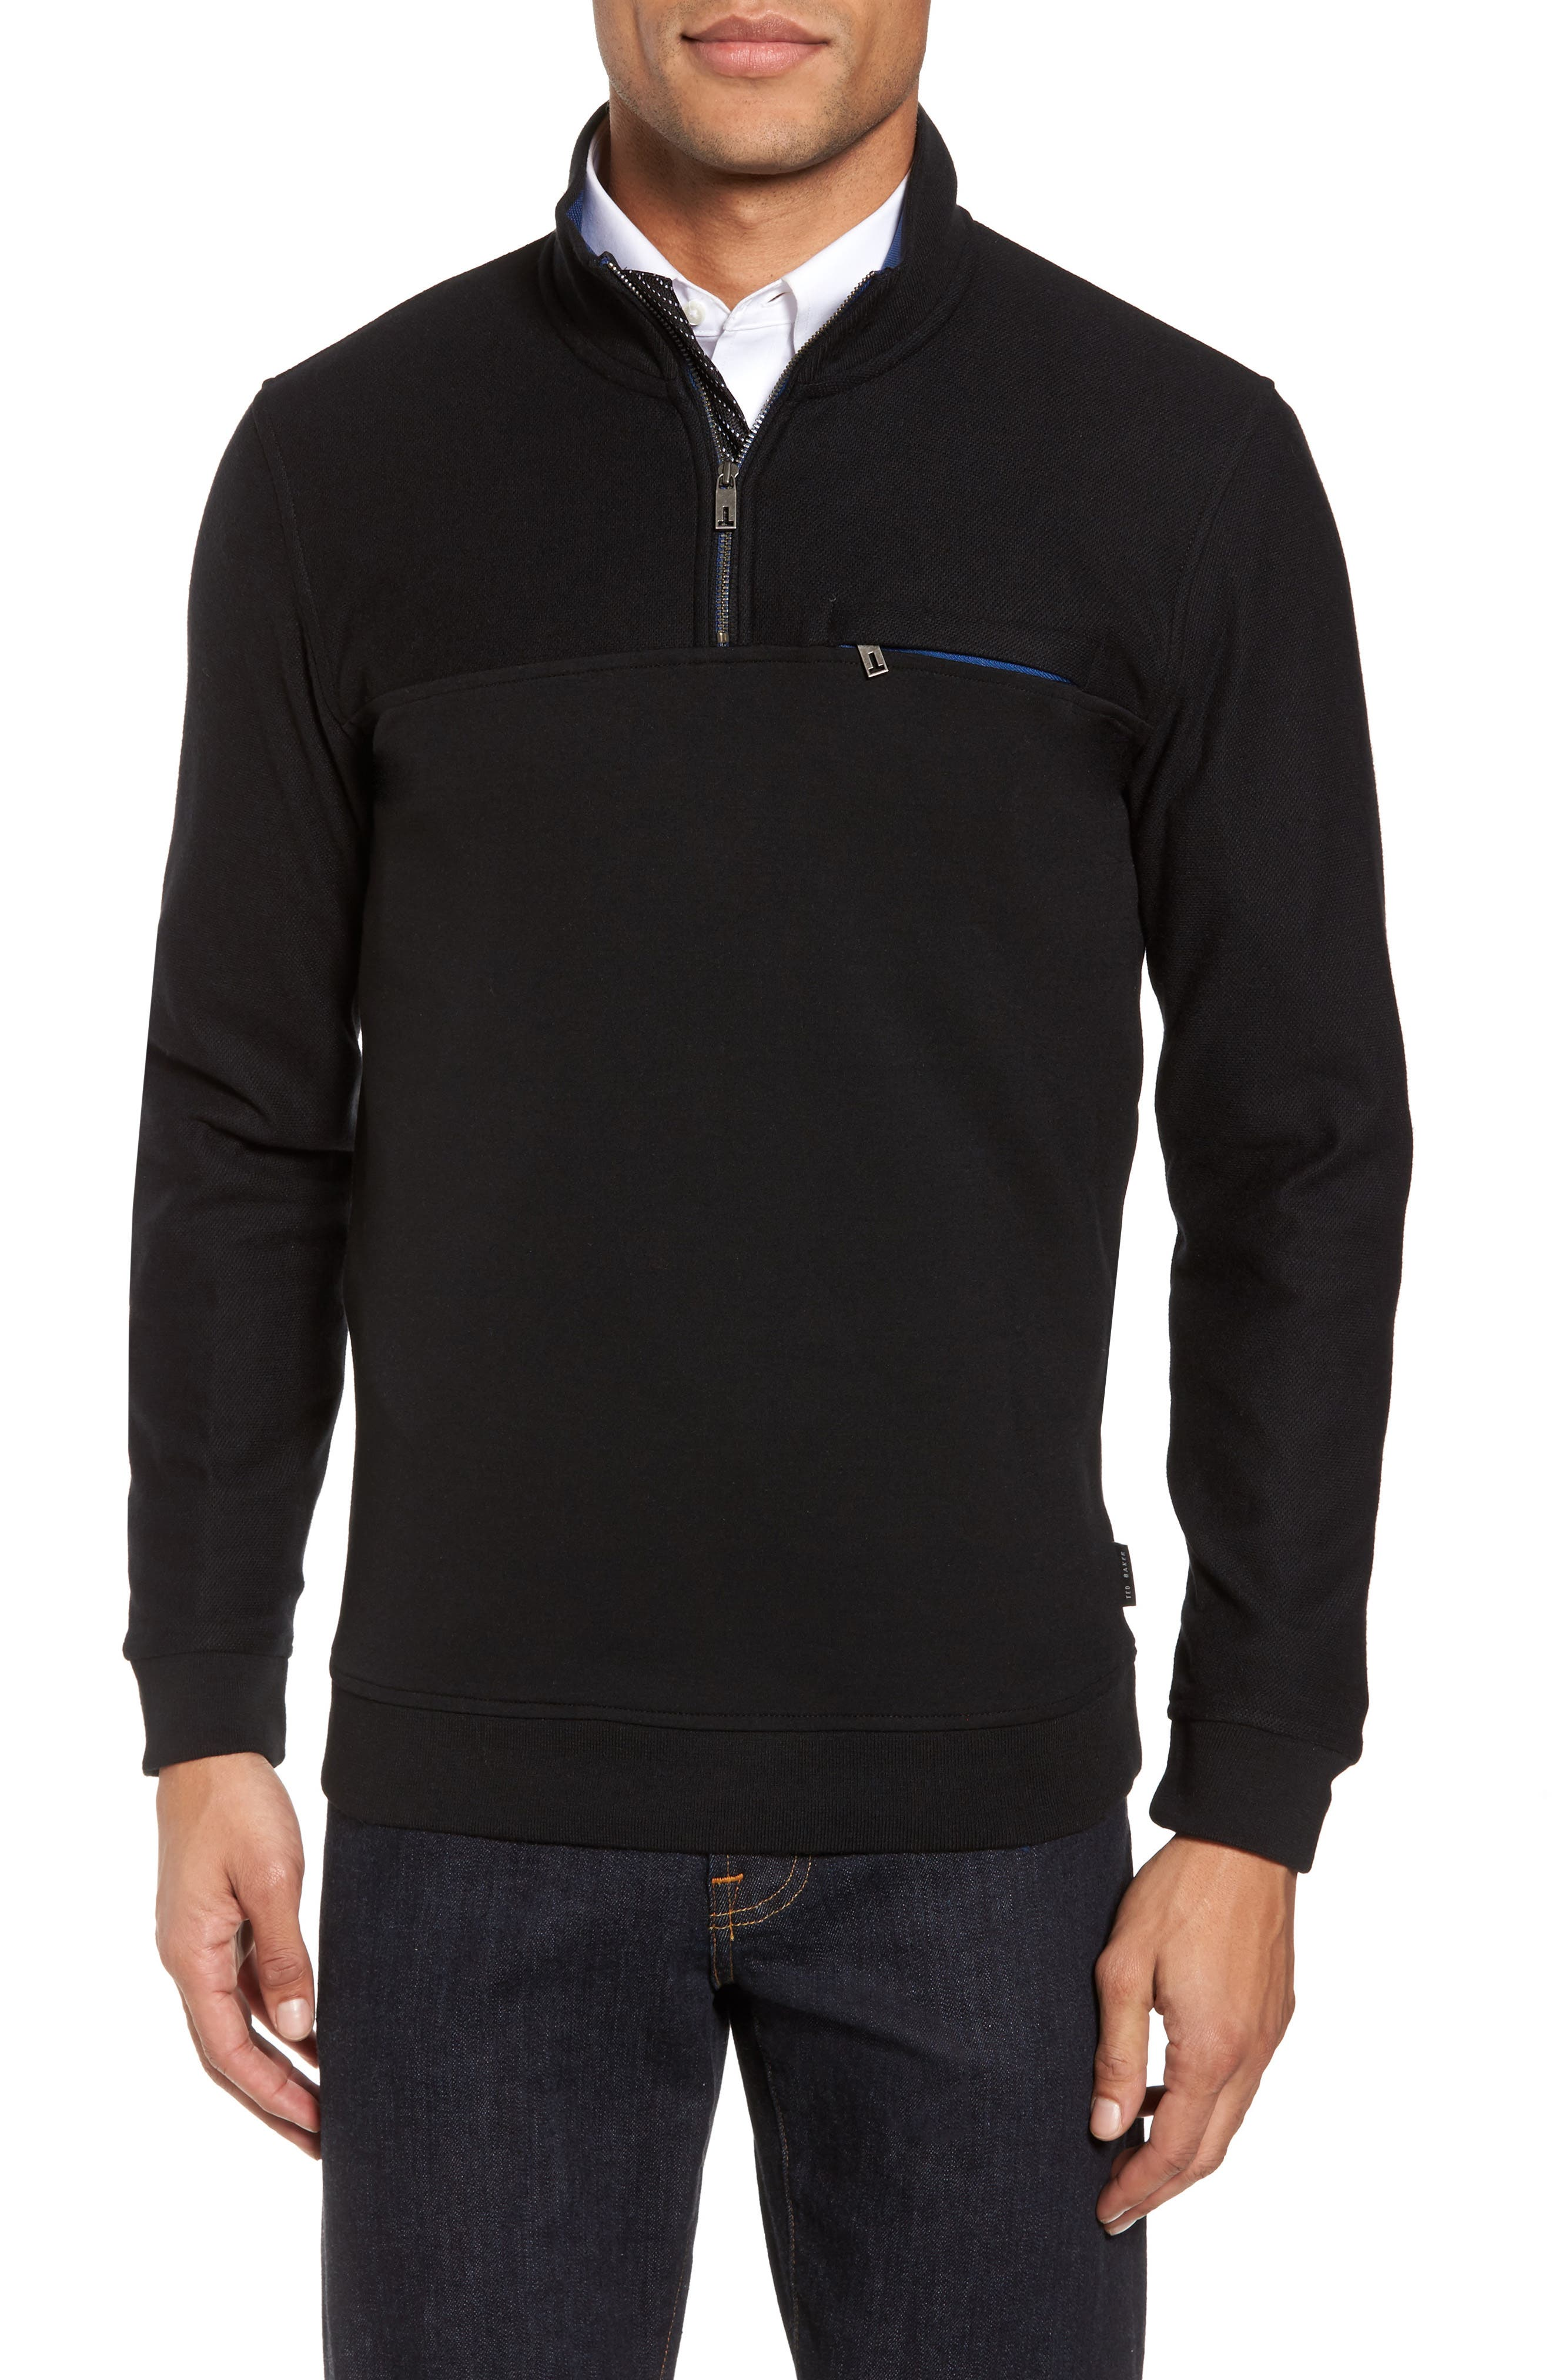 Livstay Slim Fit Quarter Zip Pullover,                             Main thumbnail 1, color,                             001